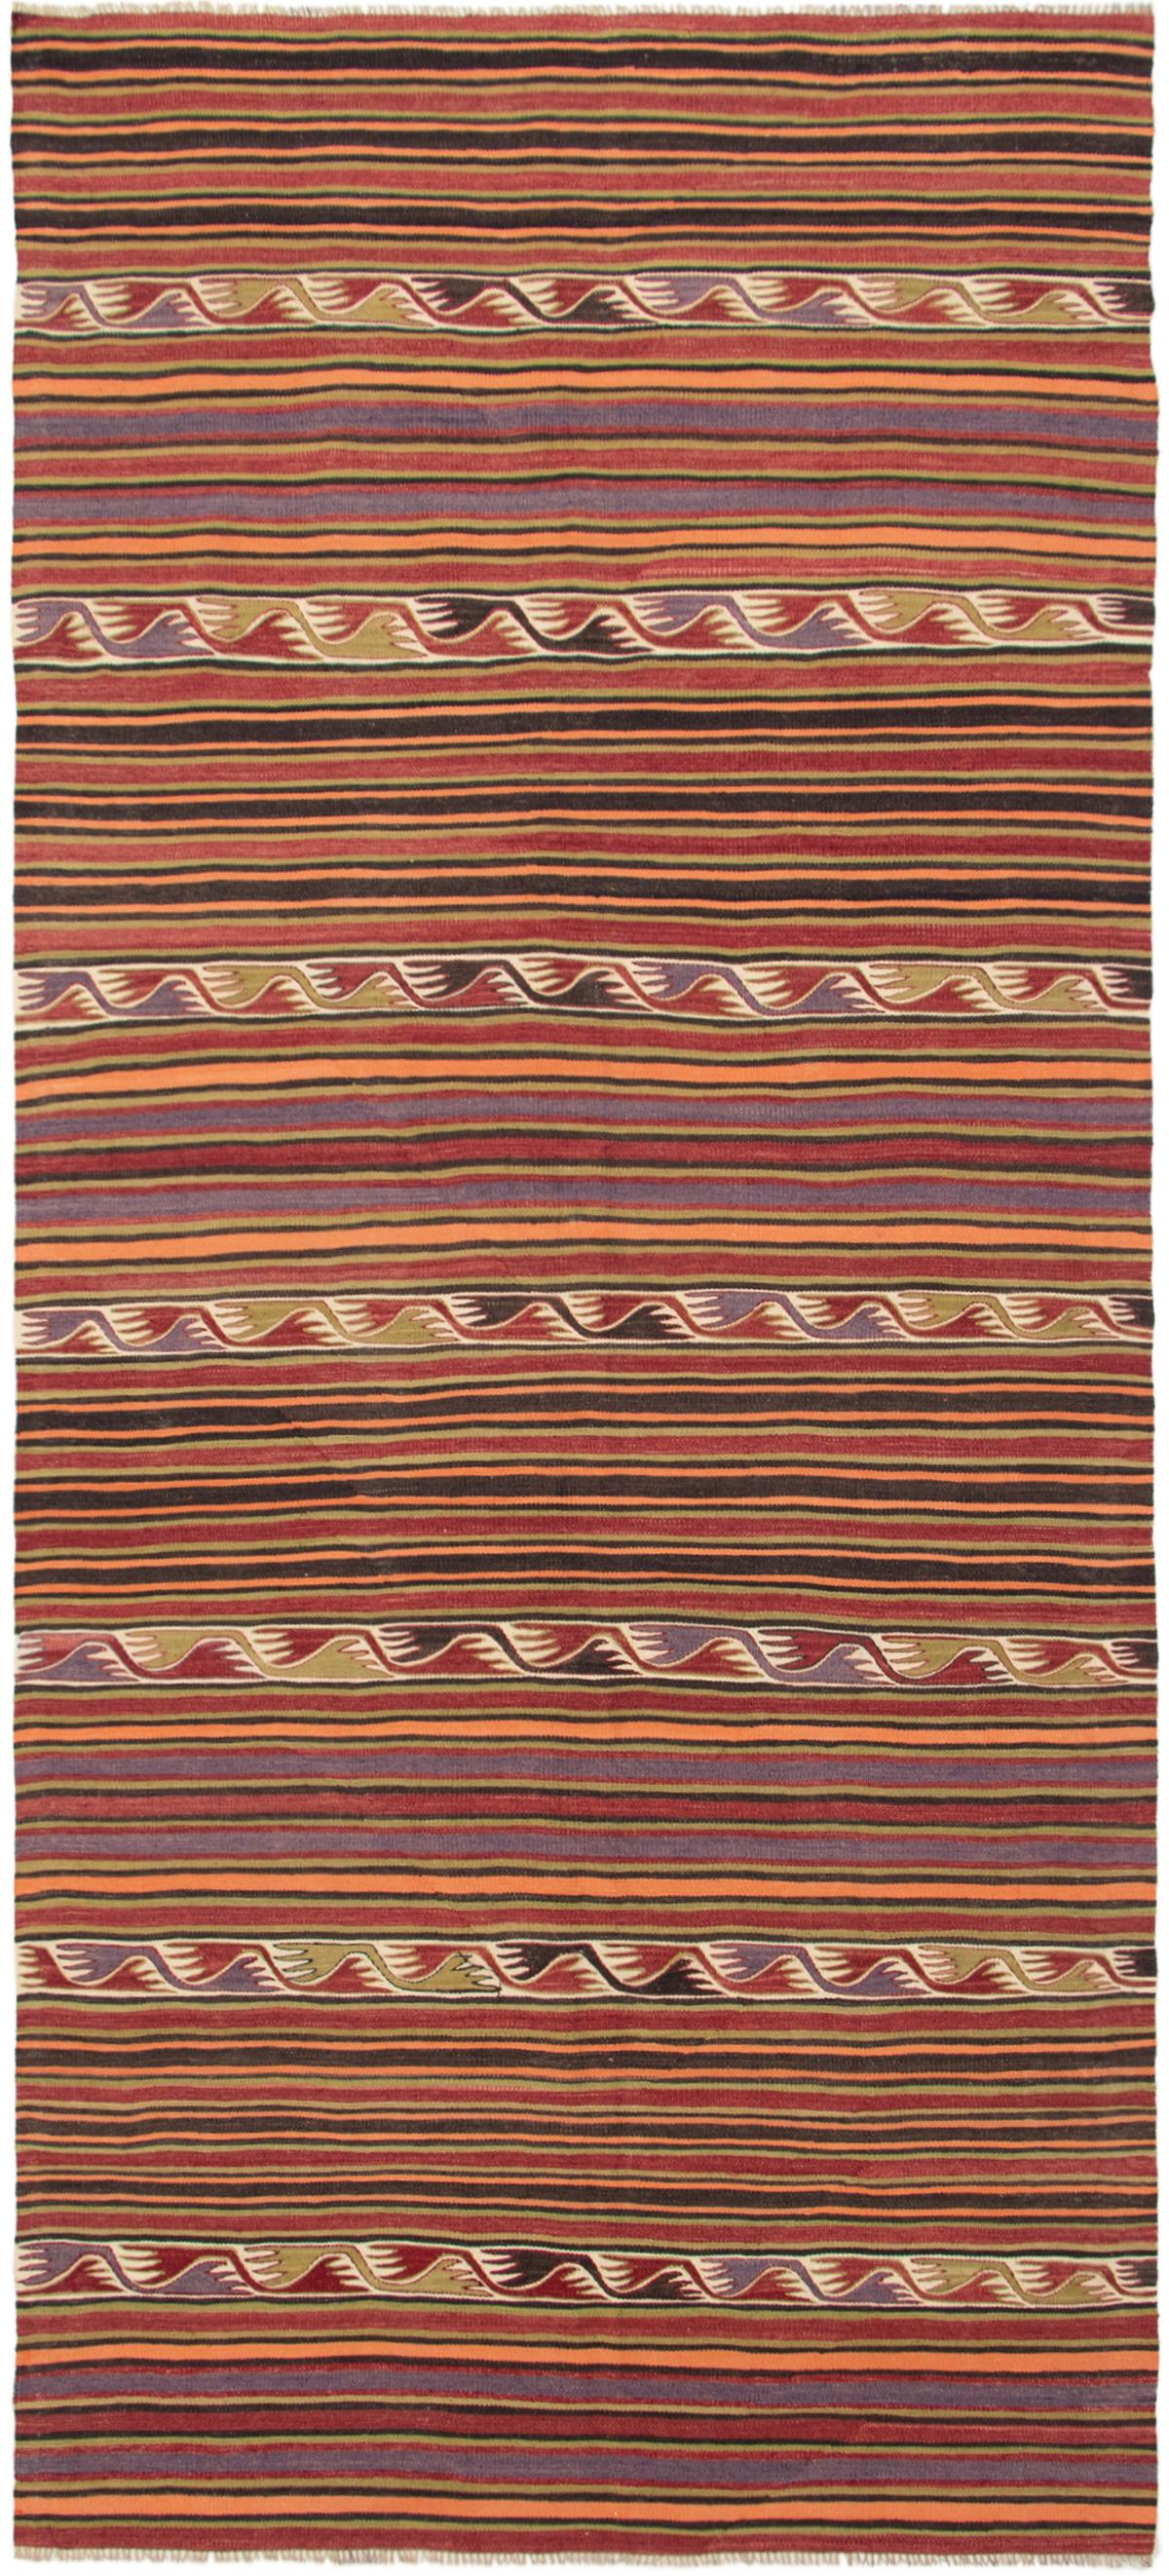 "Hand woven Bohemian Dark Red Wool Kilim 5'0"" x 12'6"" Size: 5'0"" x 12'6"""